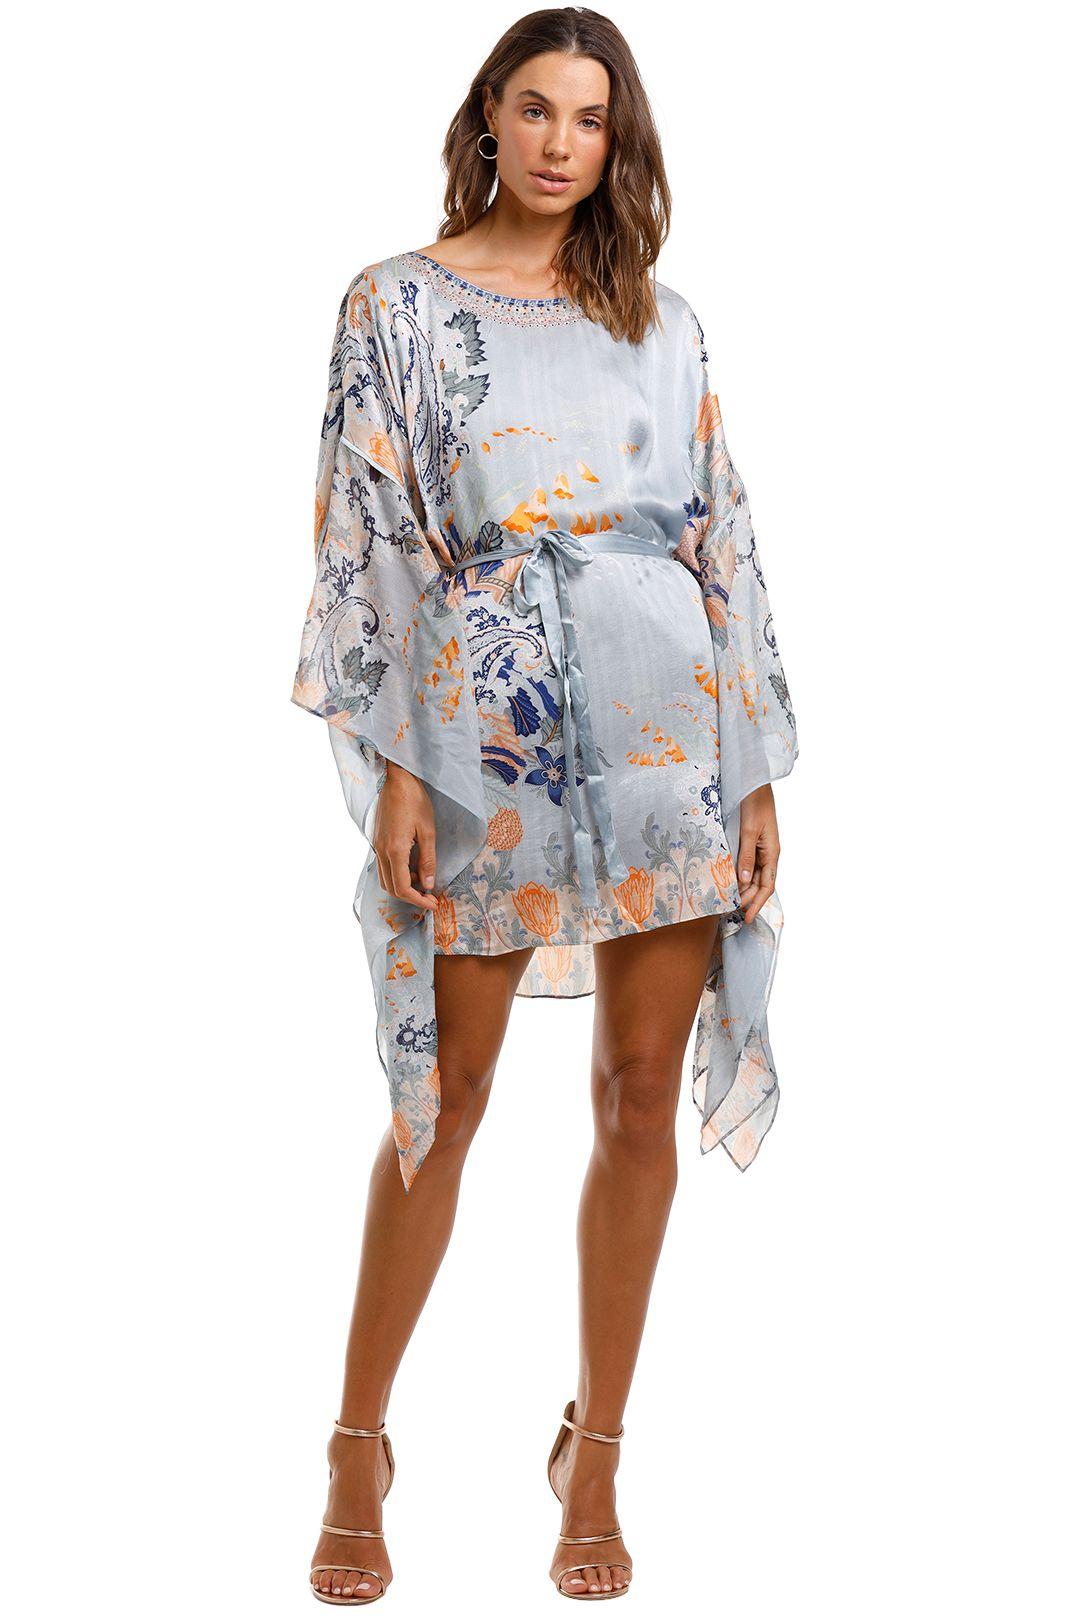 Camilla Short Kaftan With Sheer Sleeves Boho Silk Dress